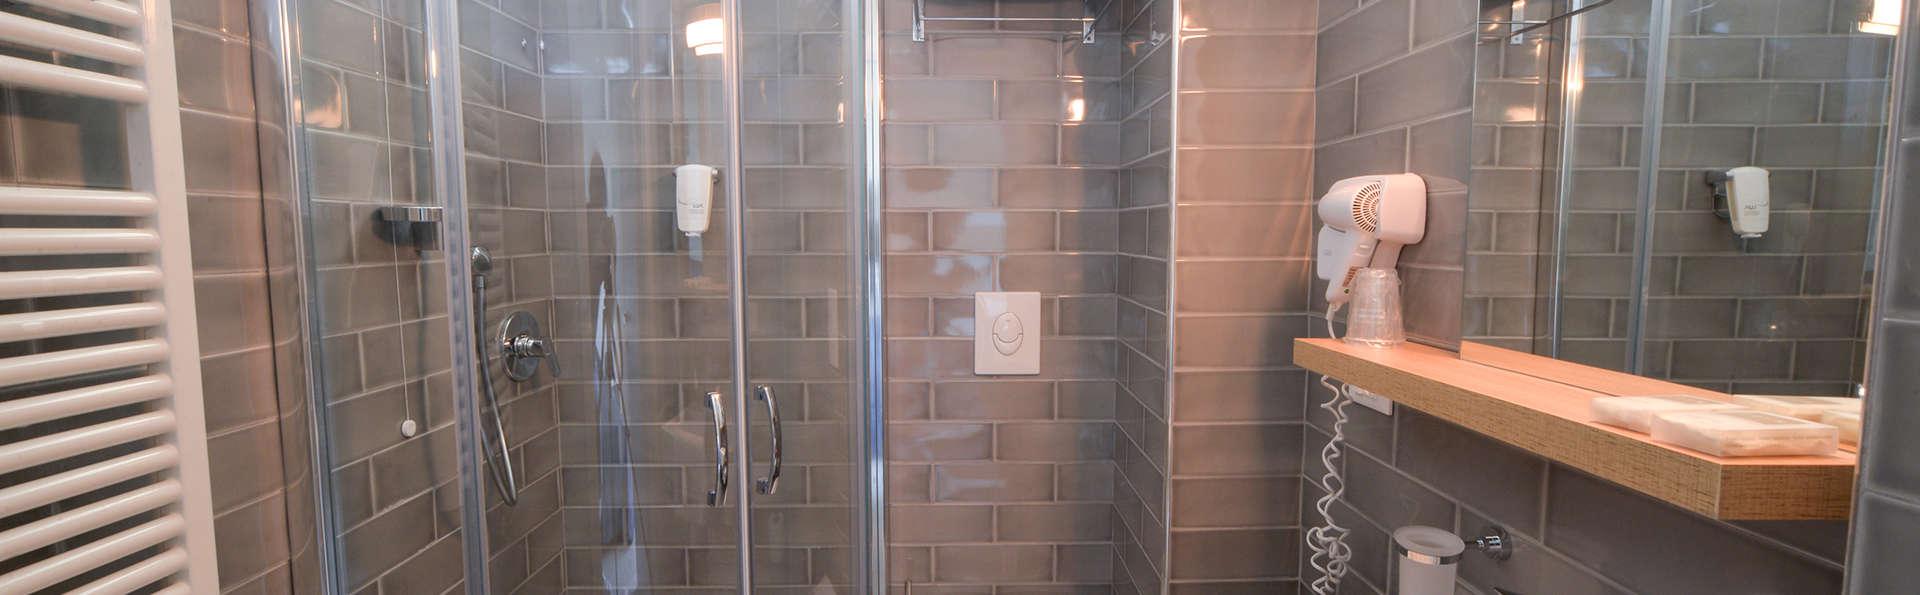 Nautilus Family Hotel - Edit_Bathroom5.jpg